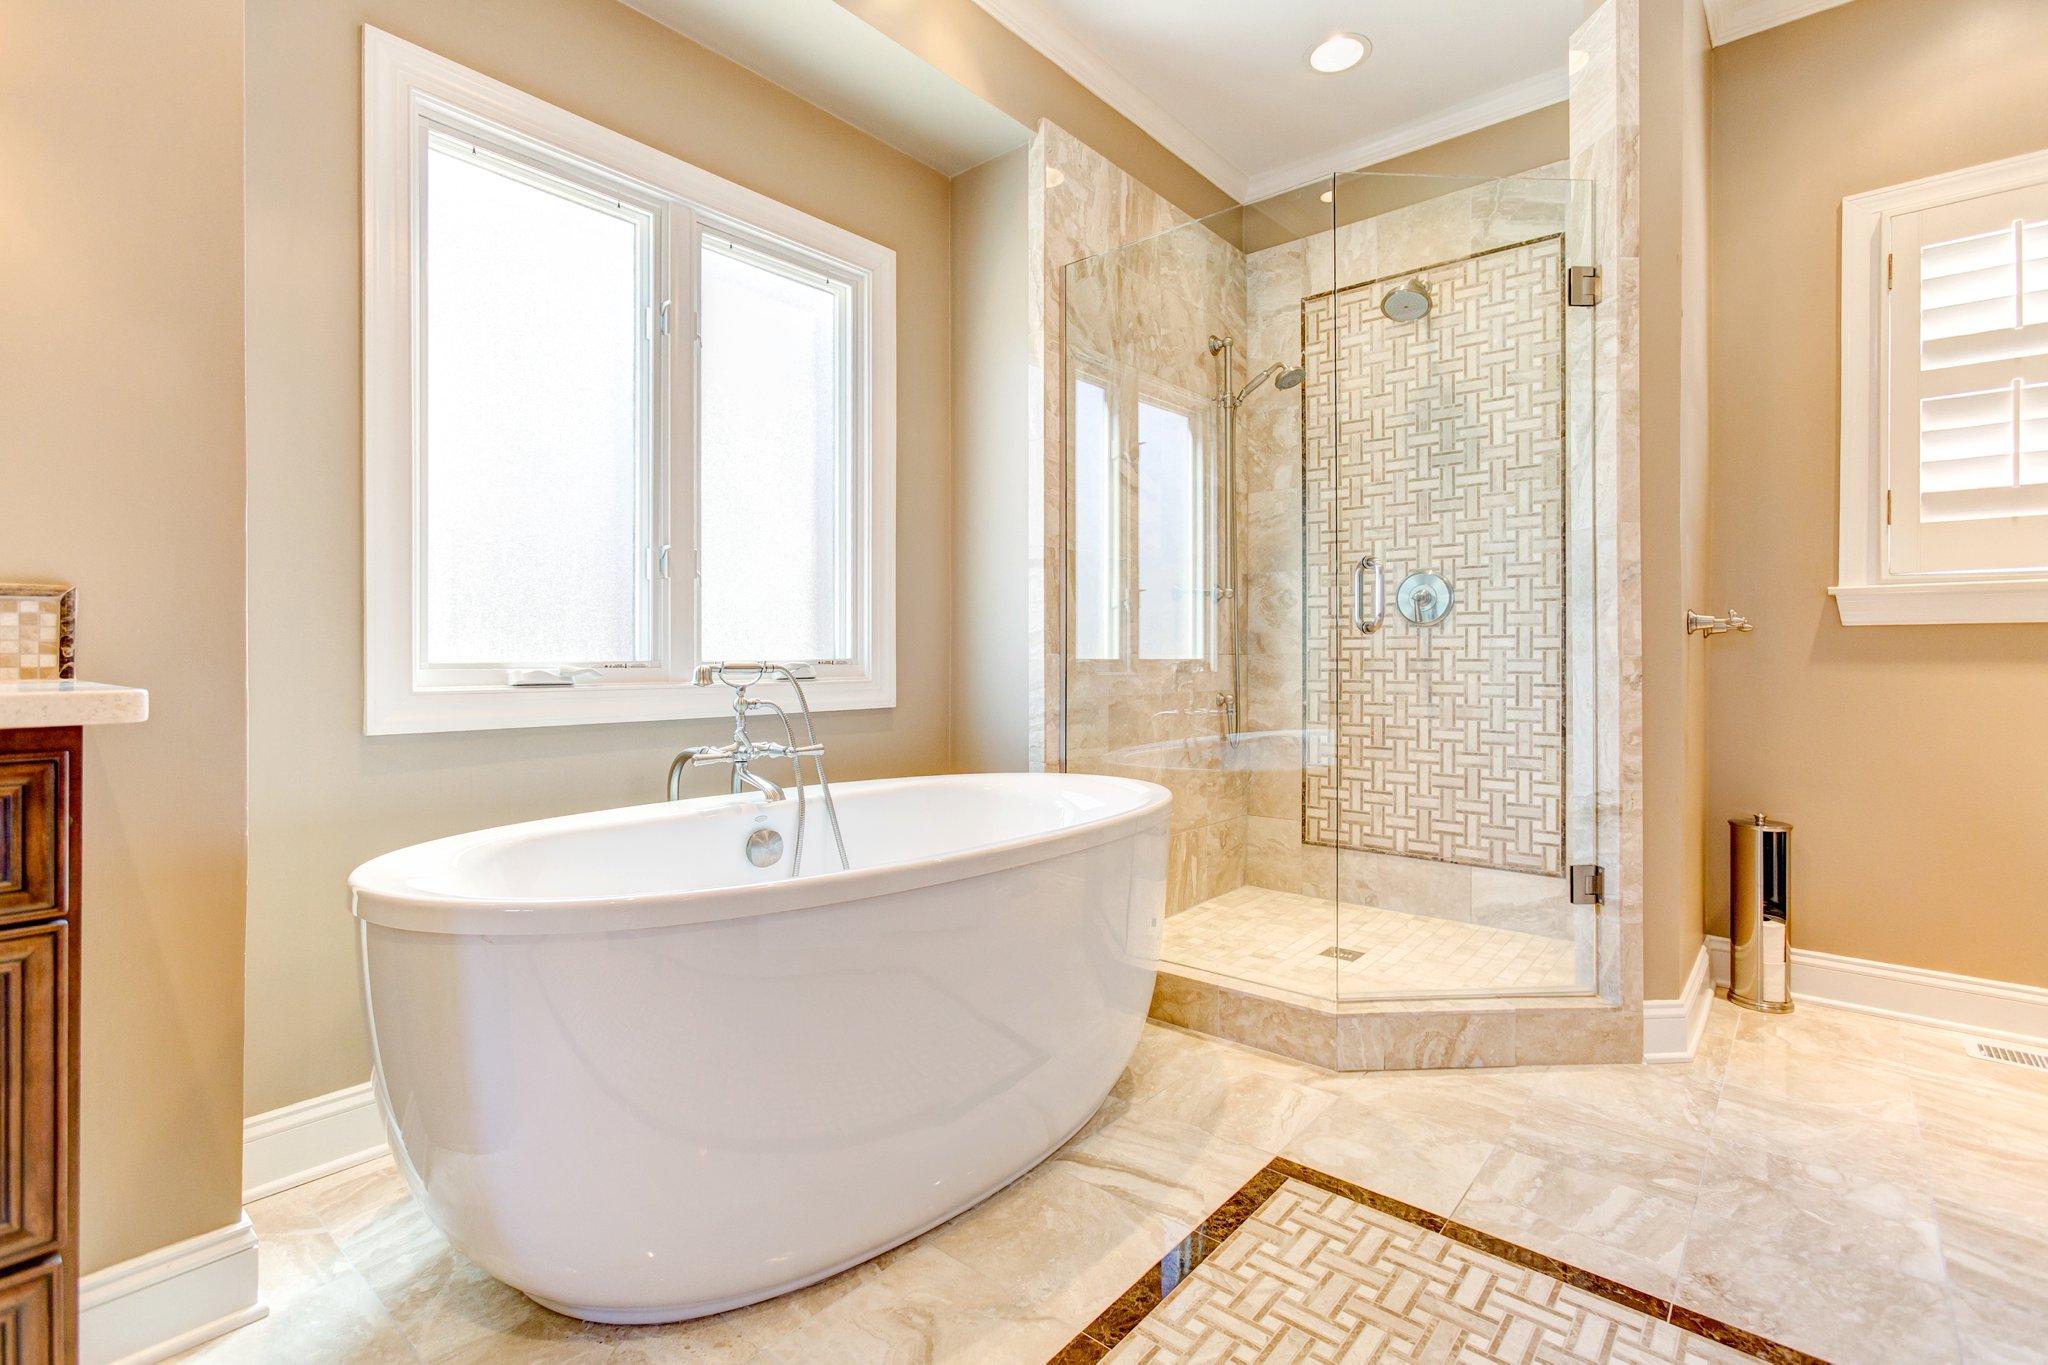 Case Design - Birmingham Bathroom Renovation — 205 Photography